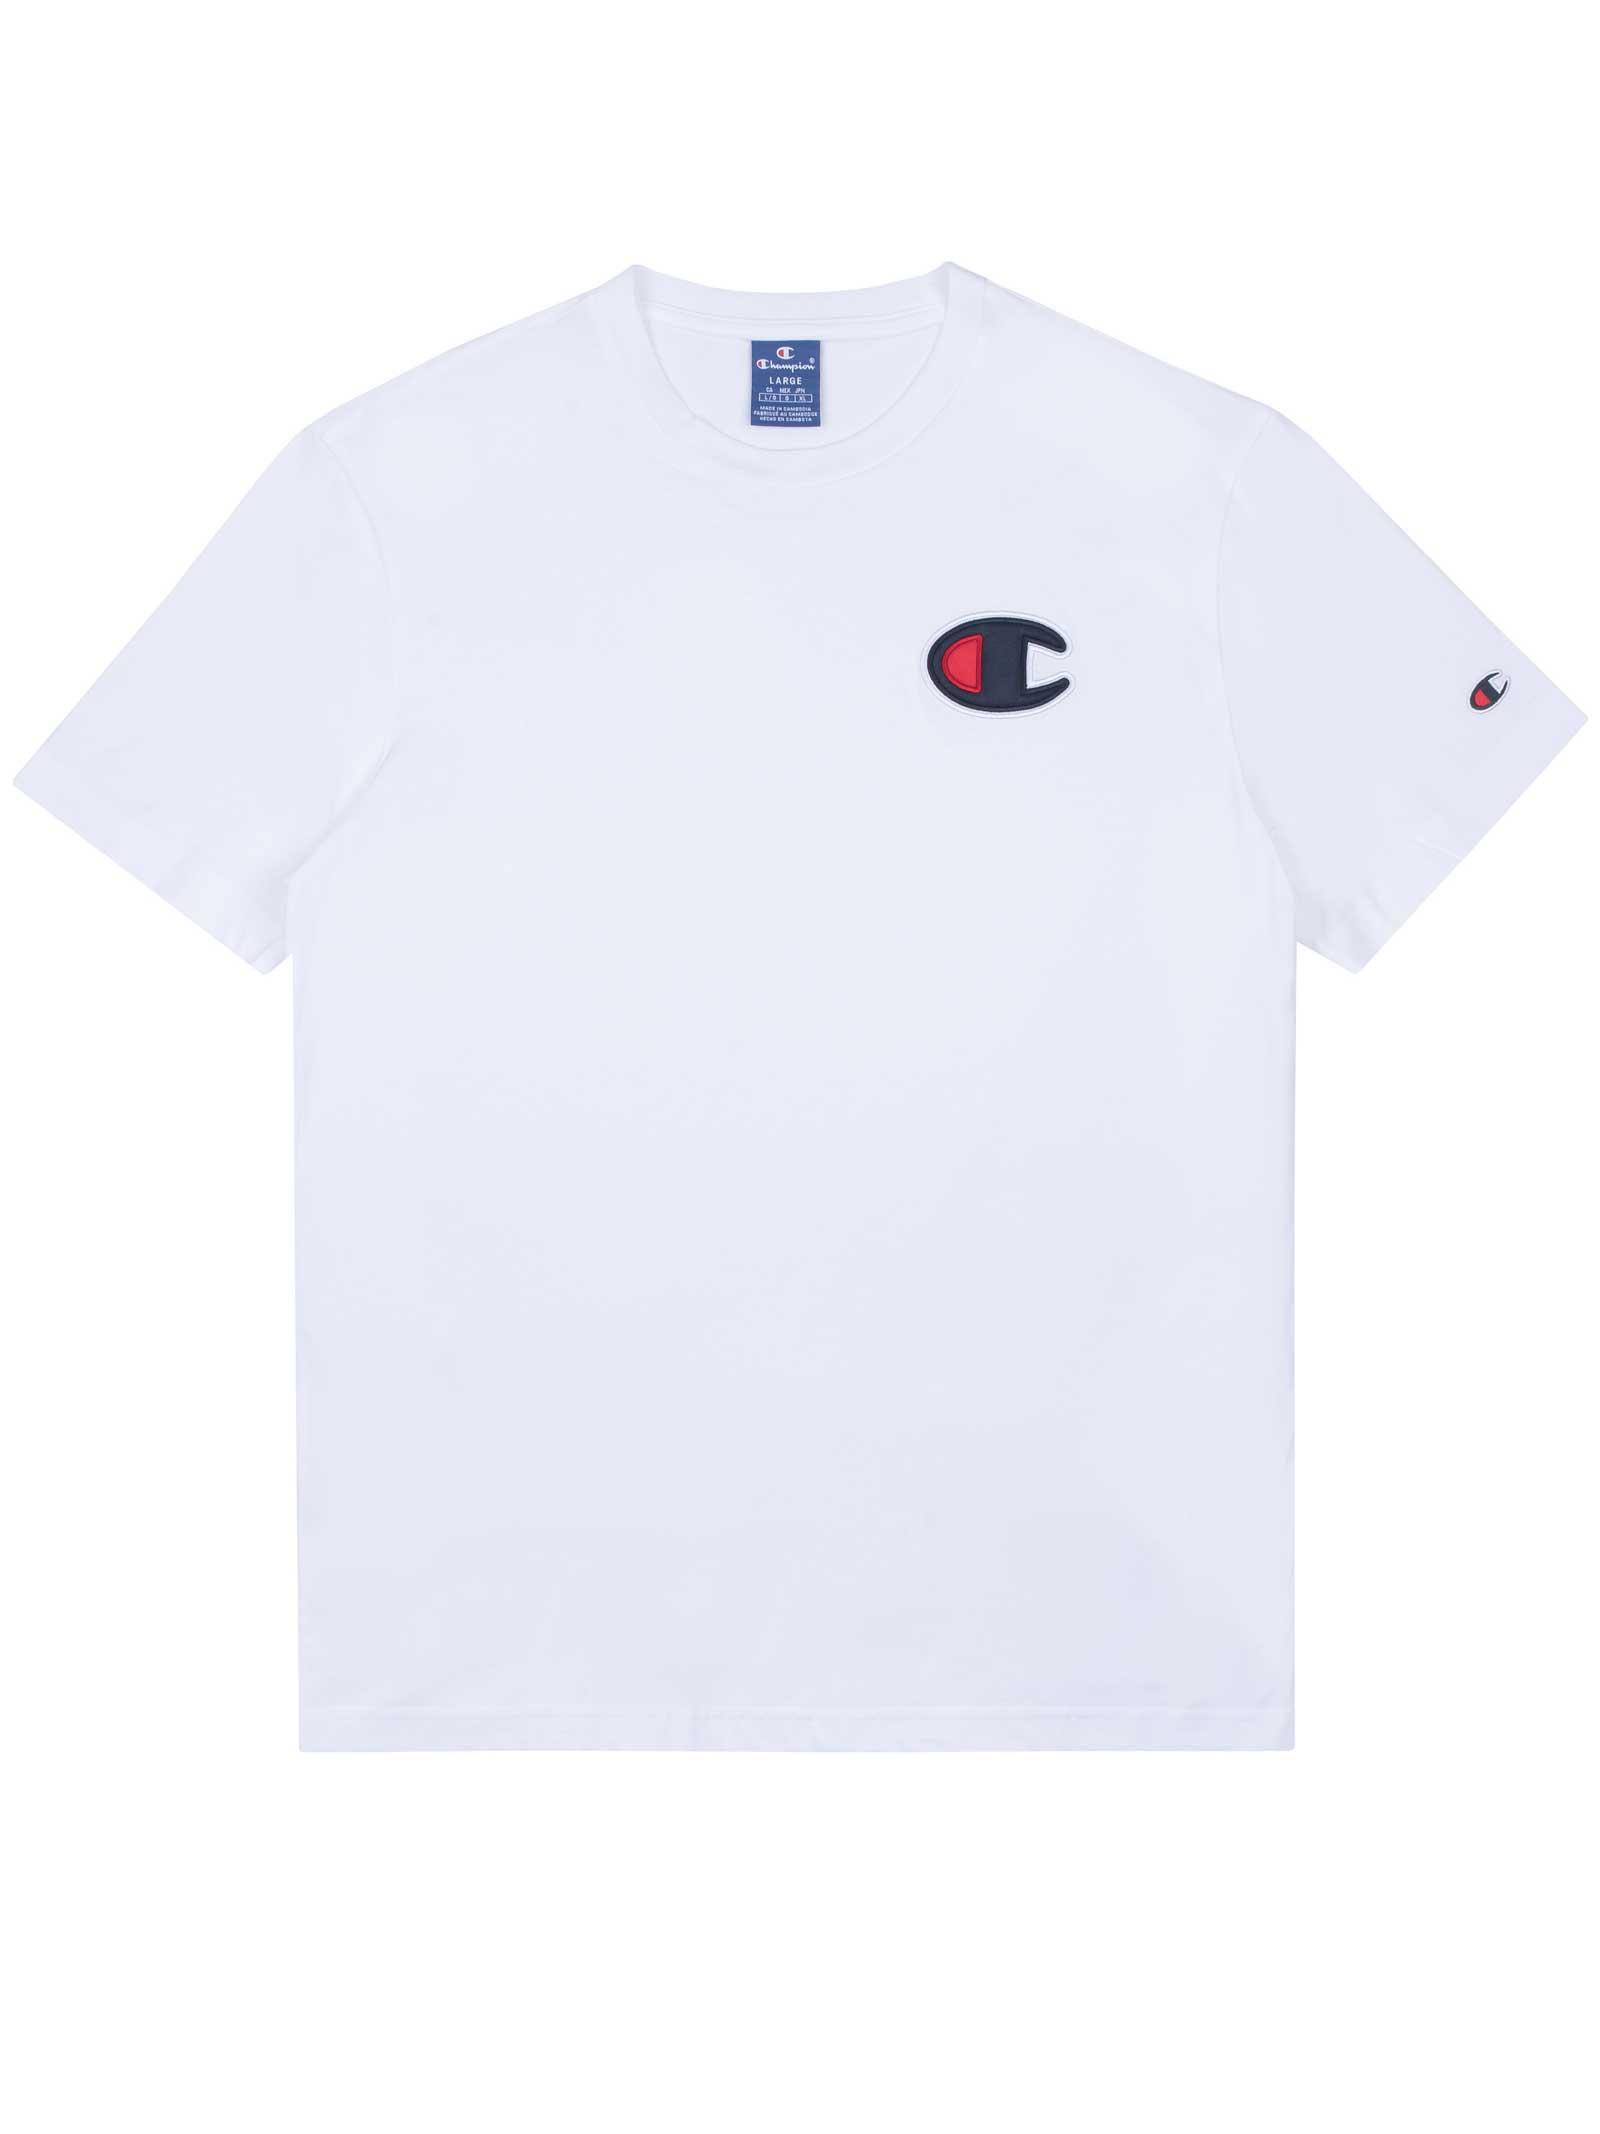 T-SHIRT UOMO CHAMPION | T-shirt | 214195WHT